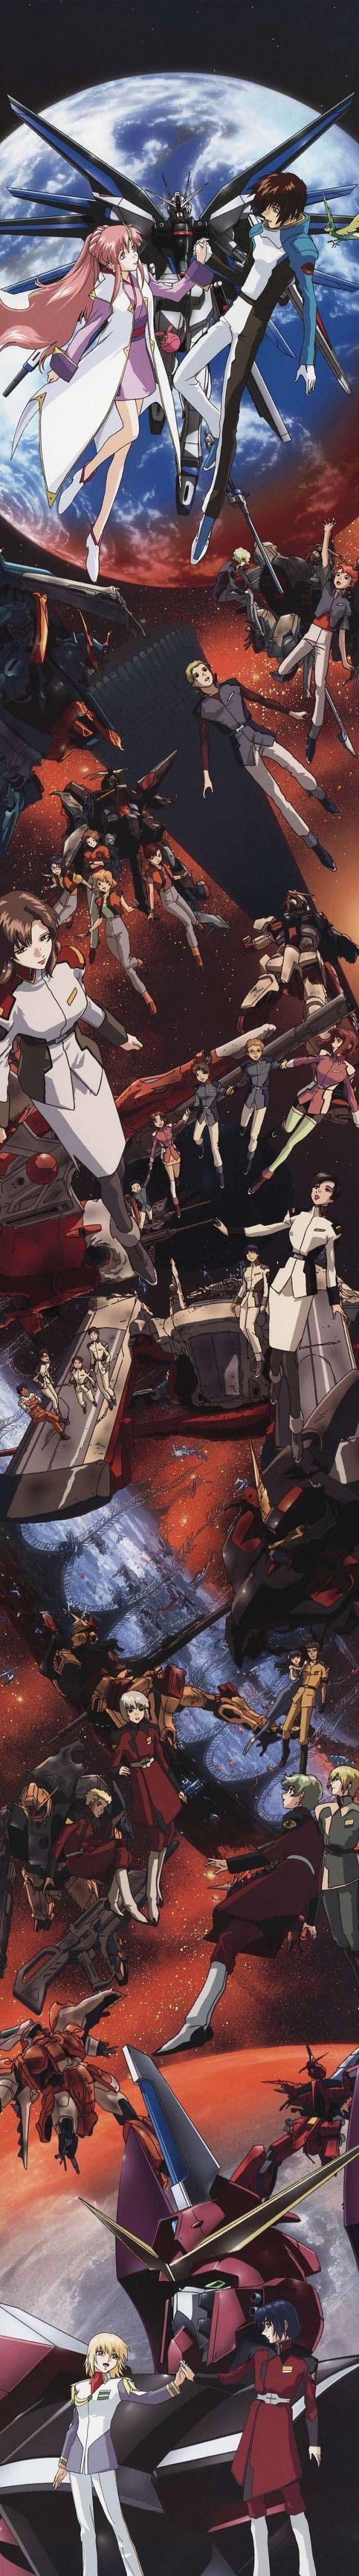 Mobile.Suit.Gundam.SEED.full.117206.jpg (576×4134) ラクス